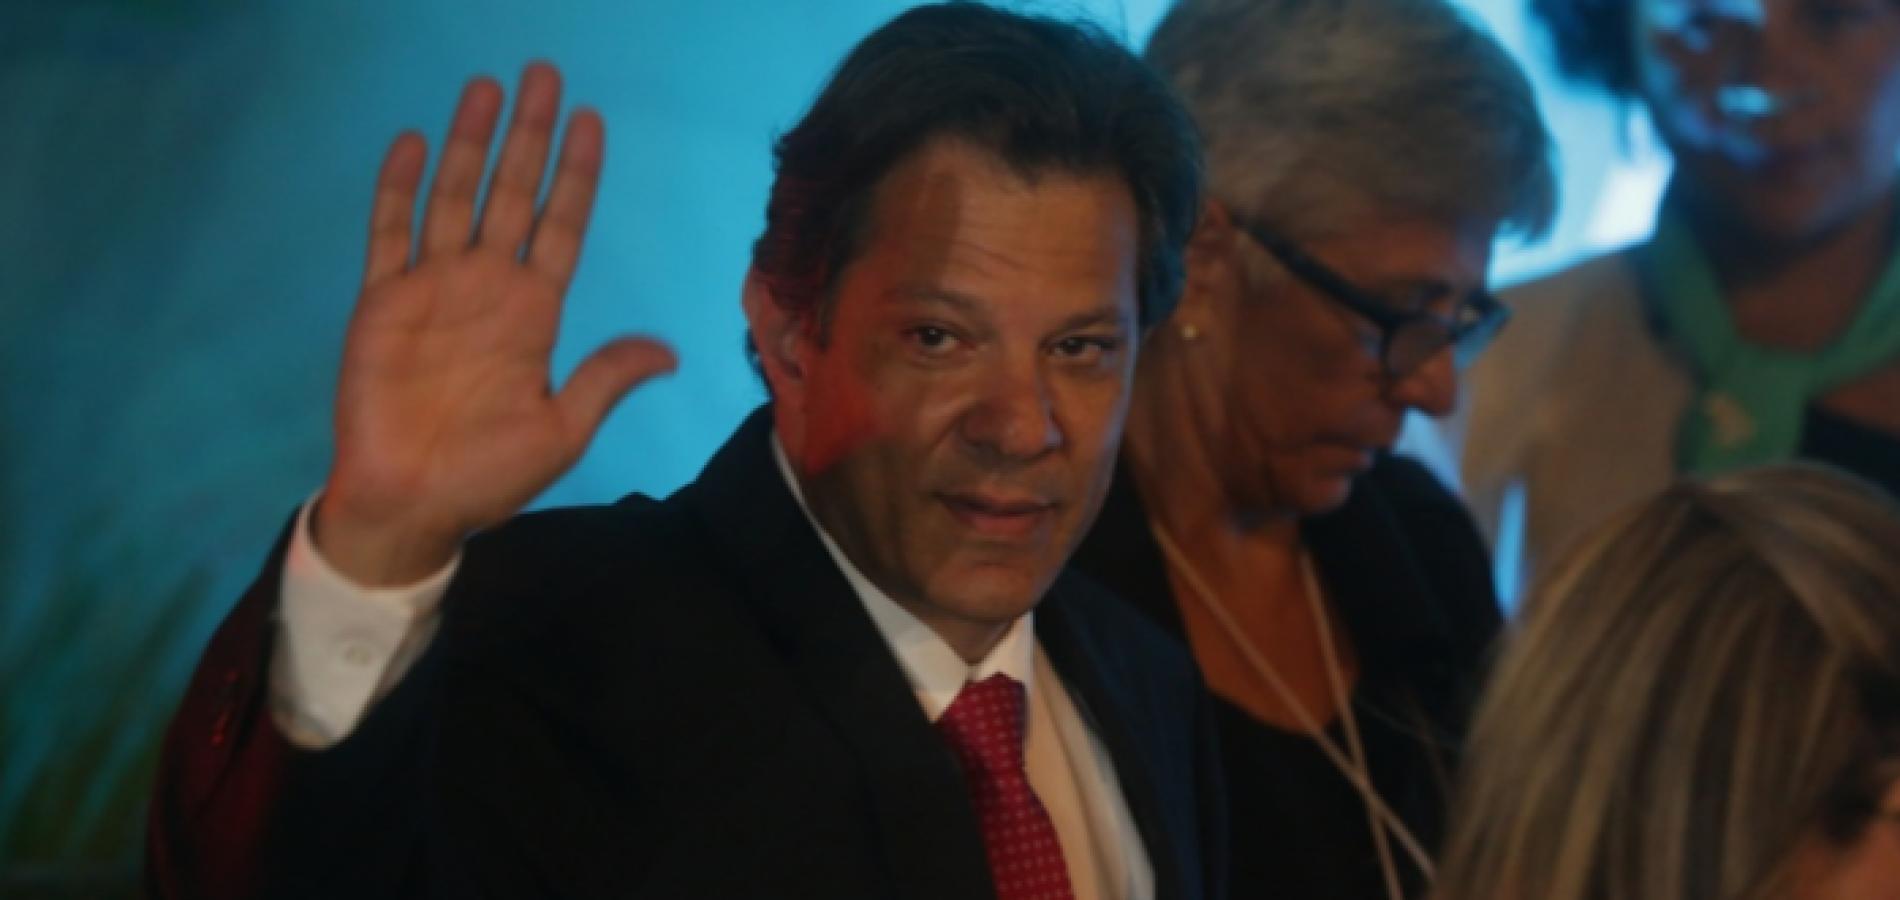 Haddad acusa Bolsonaro de divulgar 'fake news vulgares' contra sua família